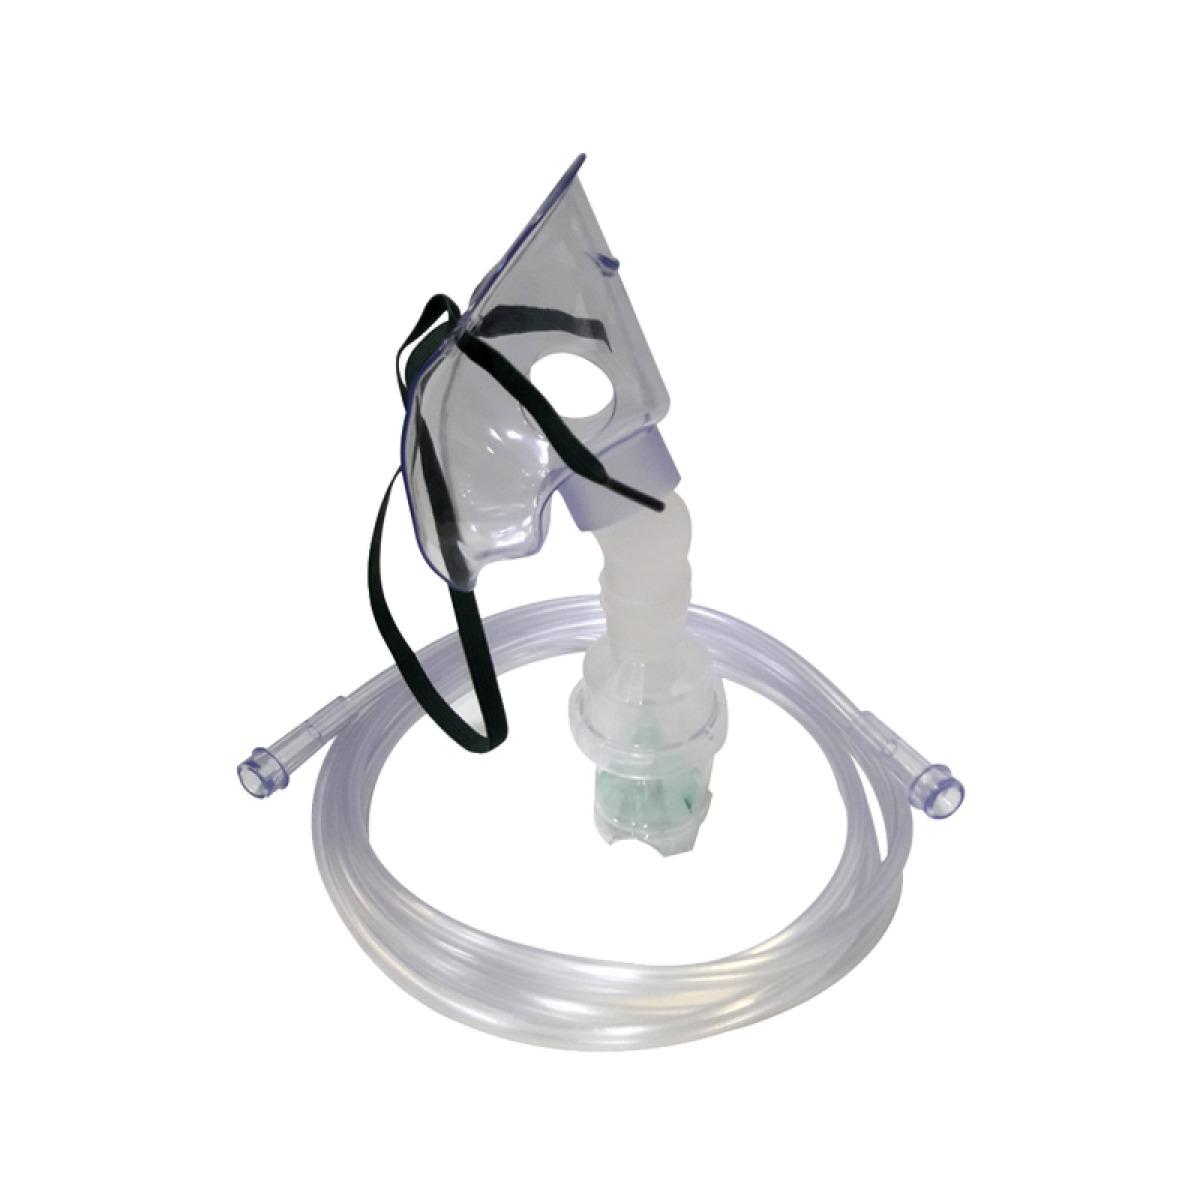 Mascarilla de nebulización